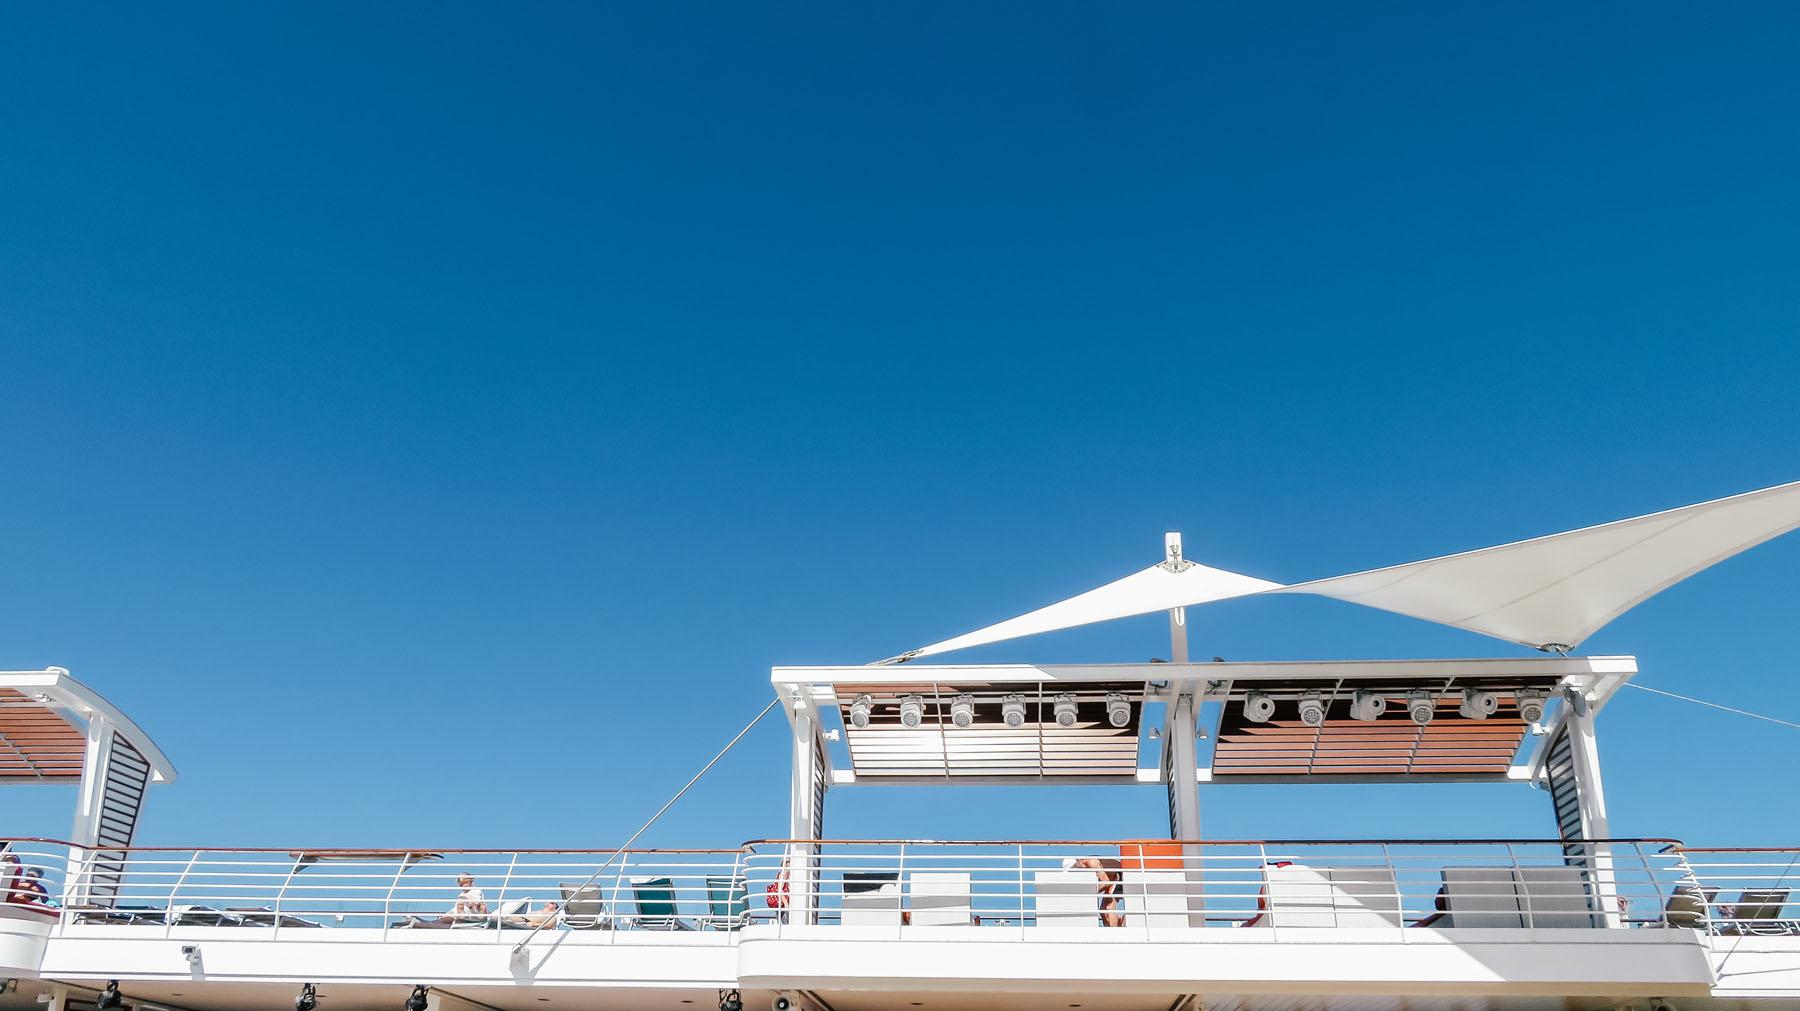 Orient Kreuzfahrt Anreise Dubai Sonnendeck